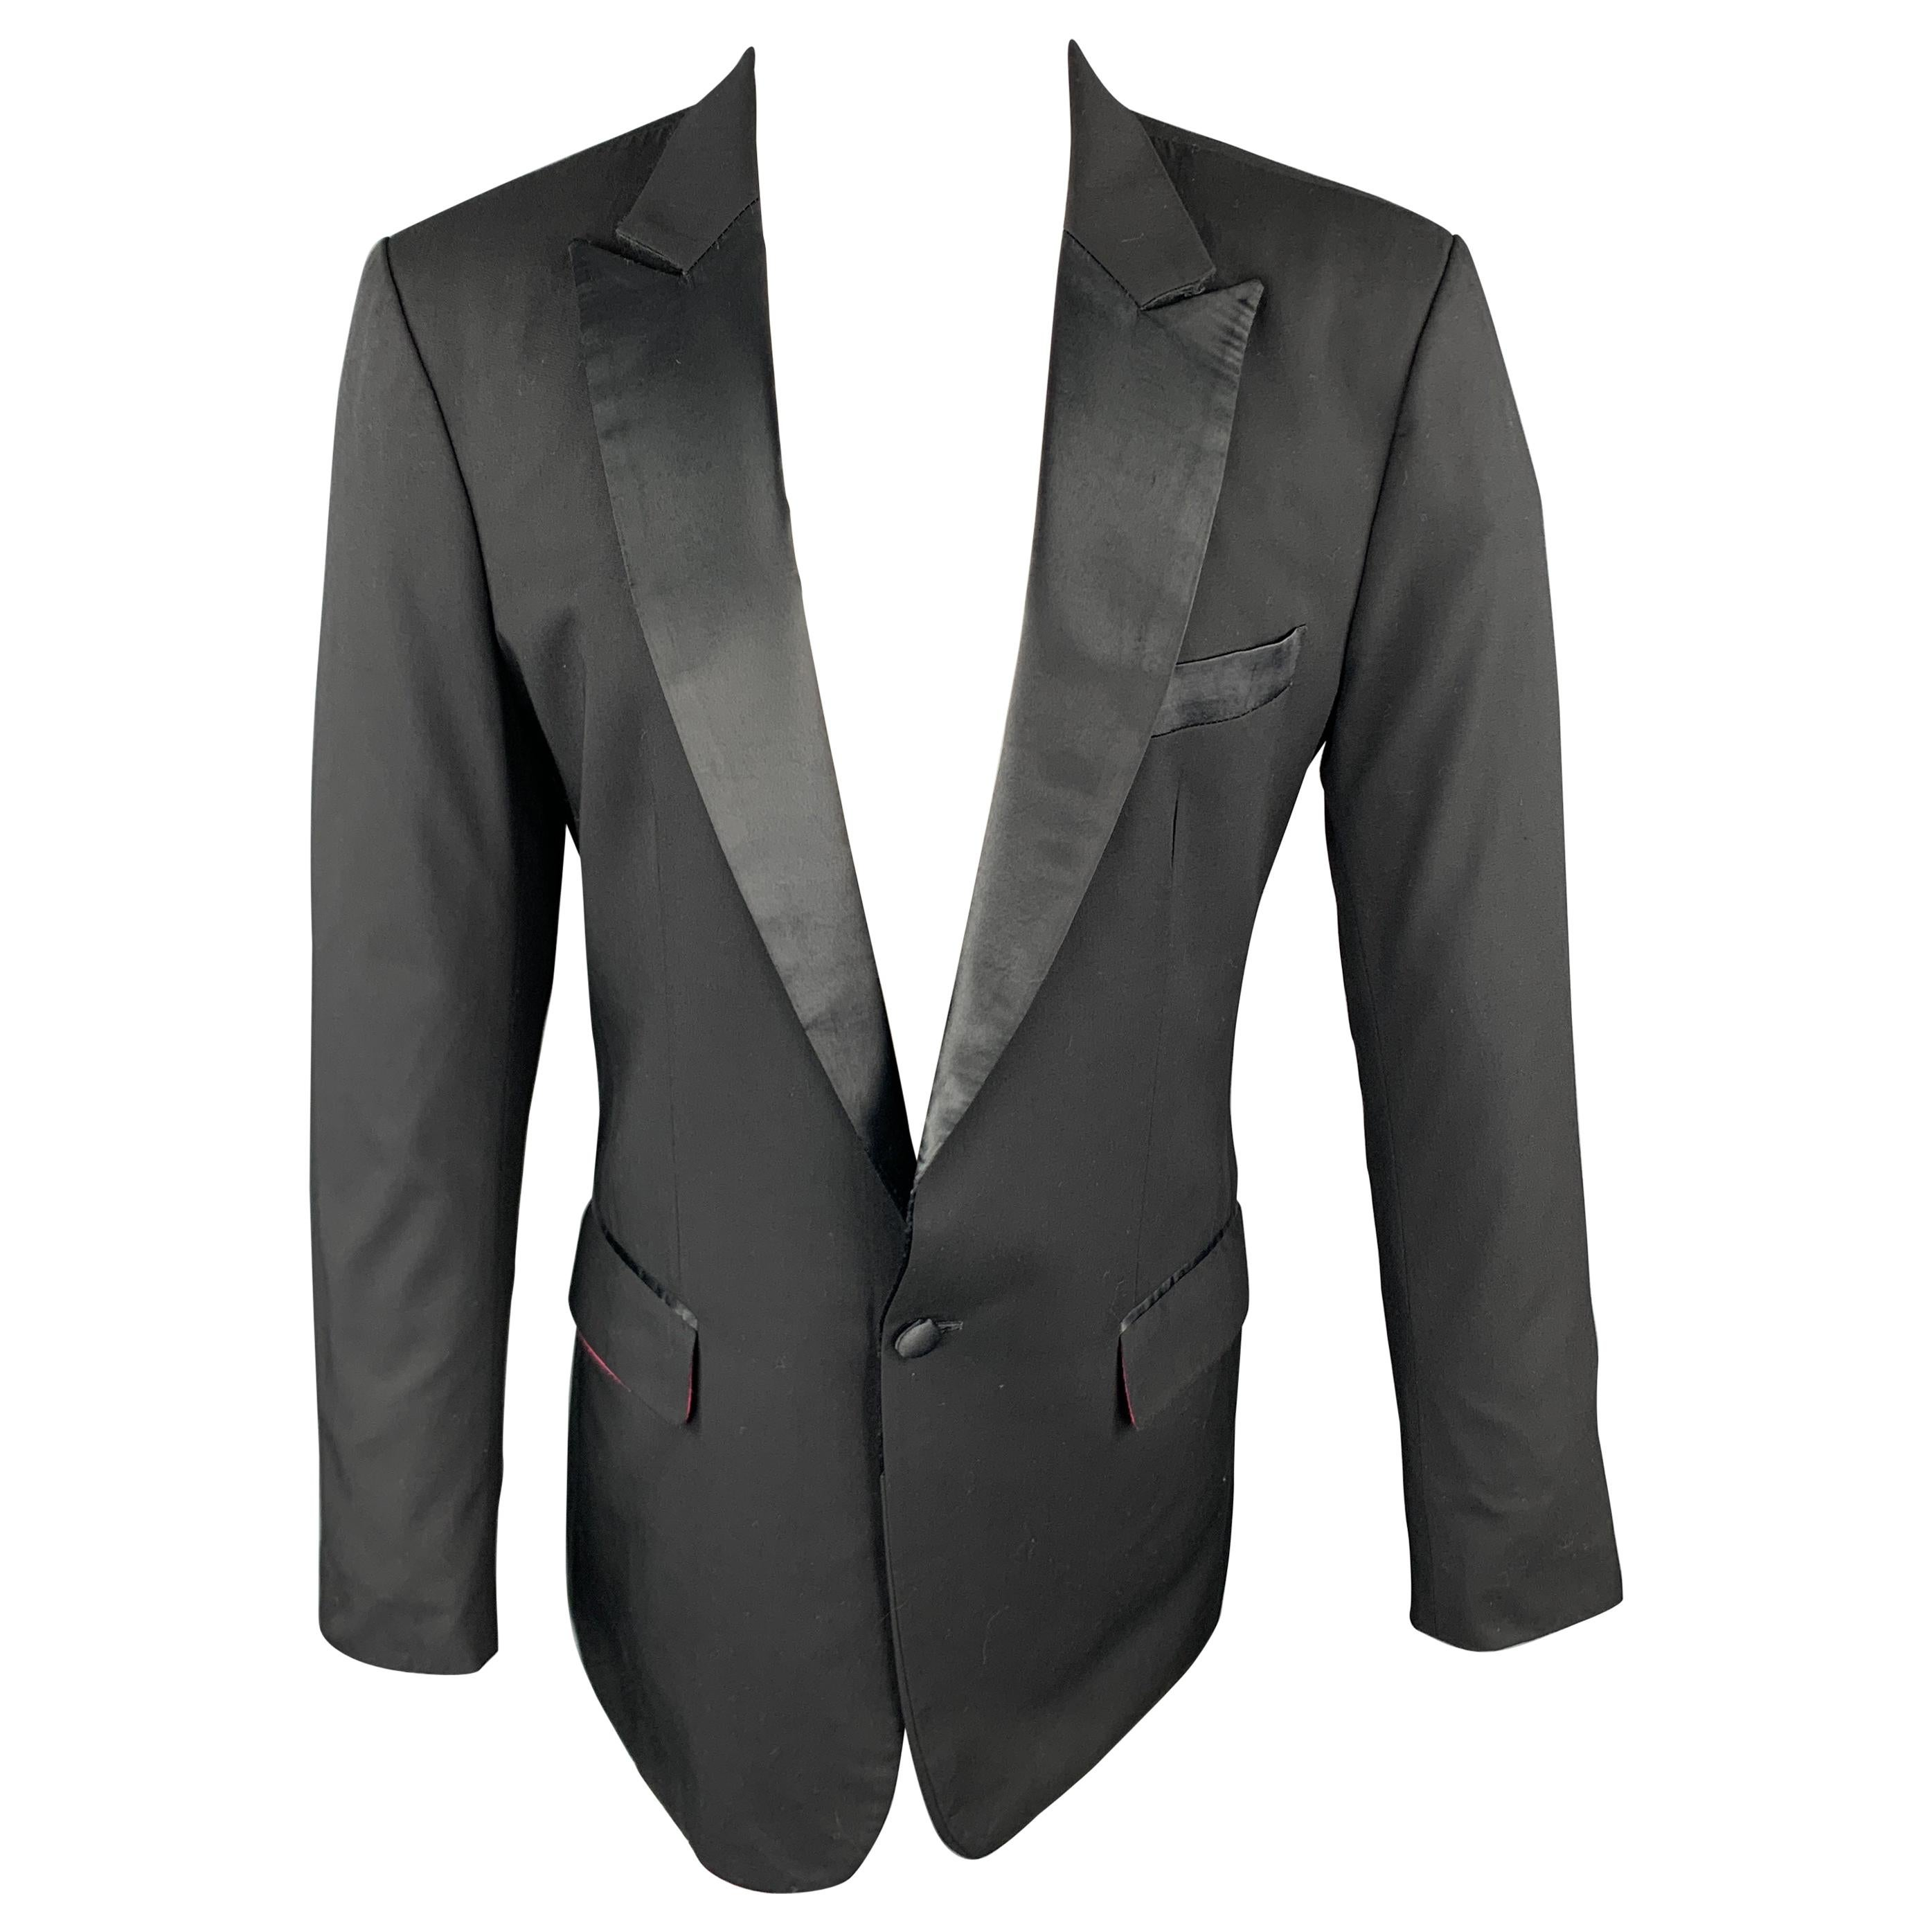 CUSTOM MADE Size 38 Black Solid Wool Peak Lapel Sport Coat